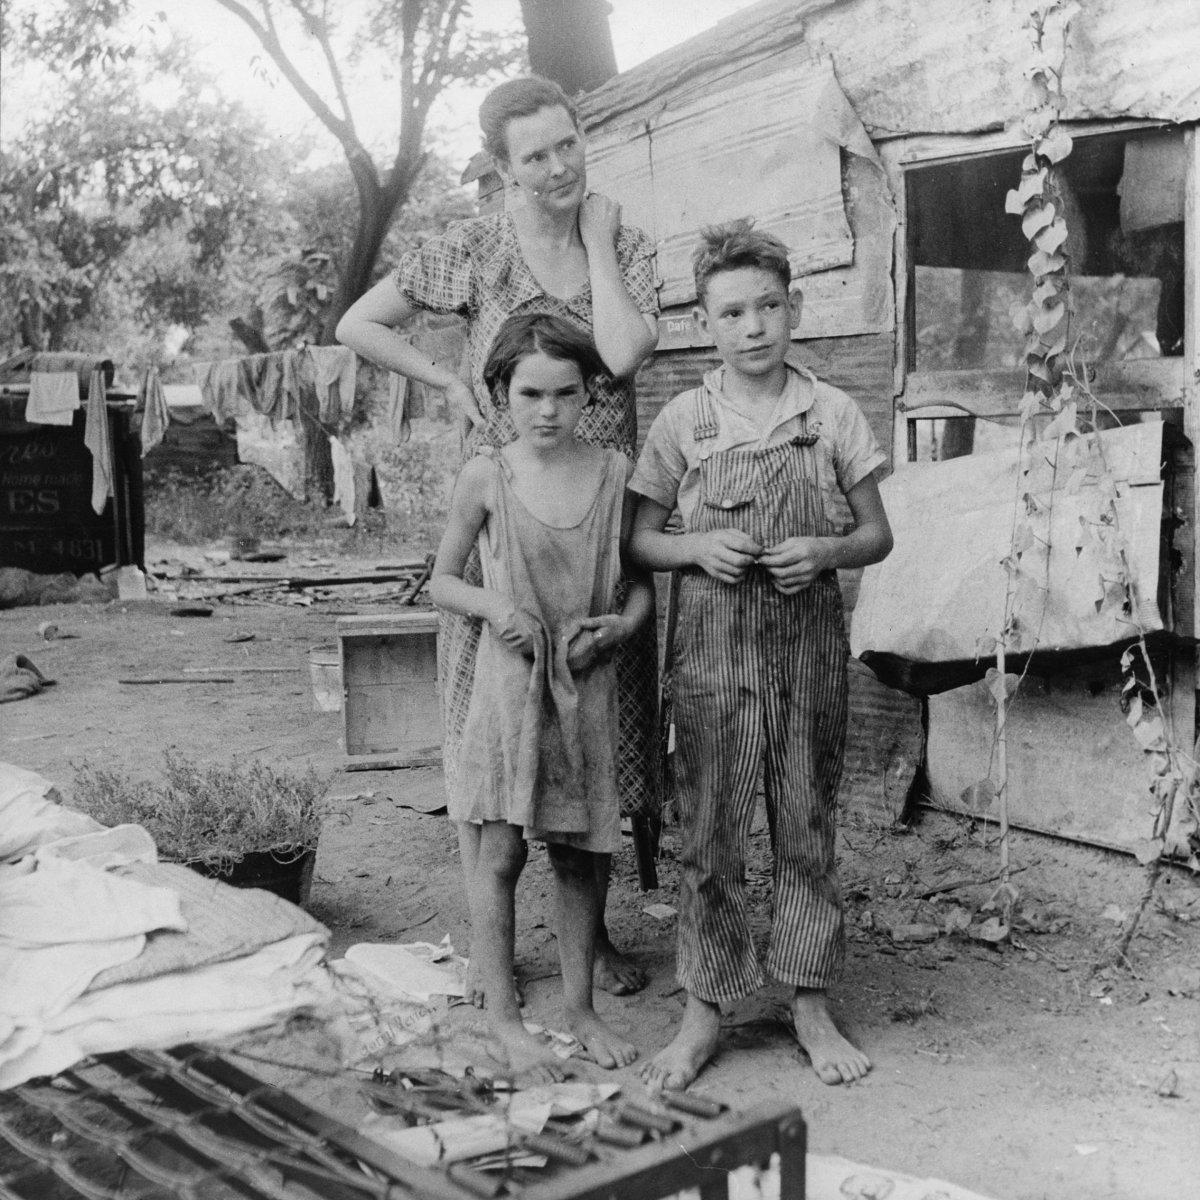 A depression era family